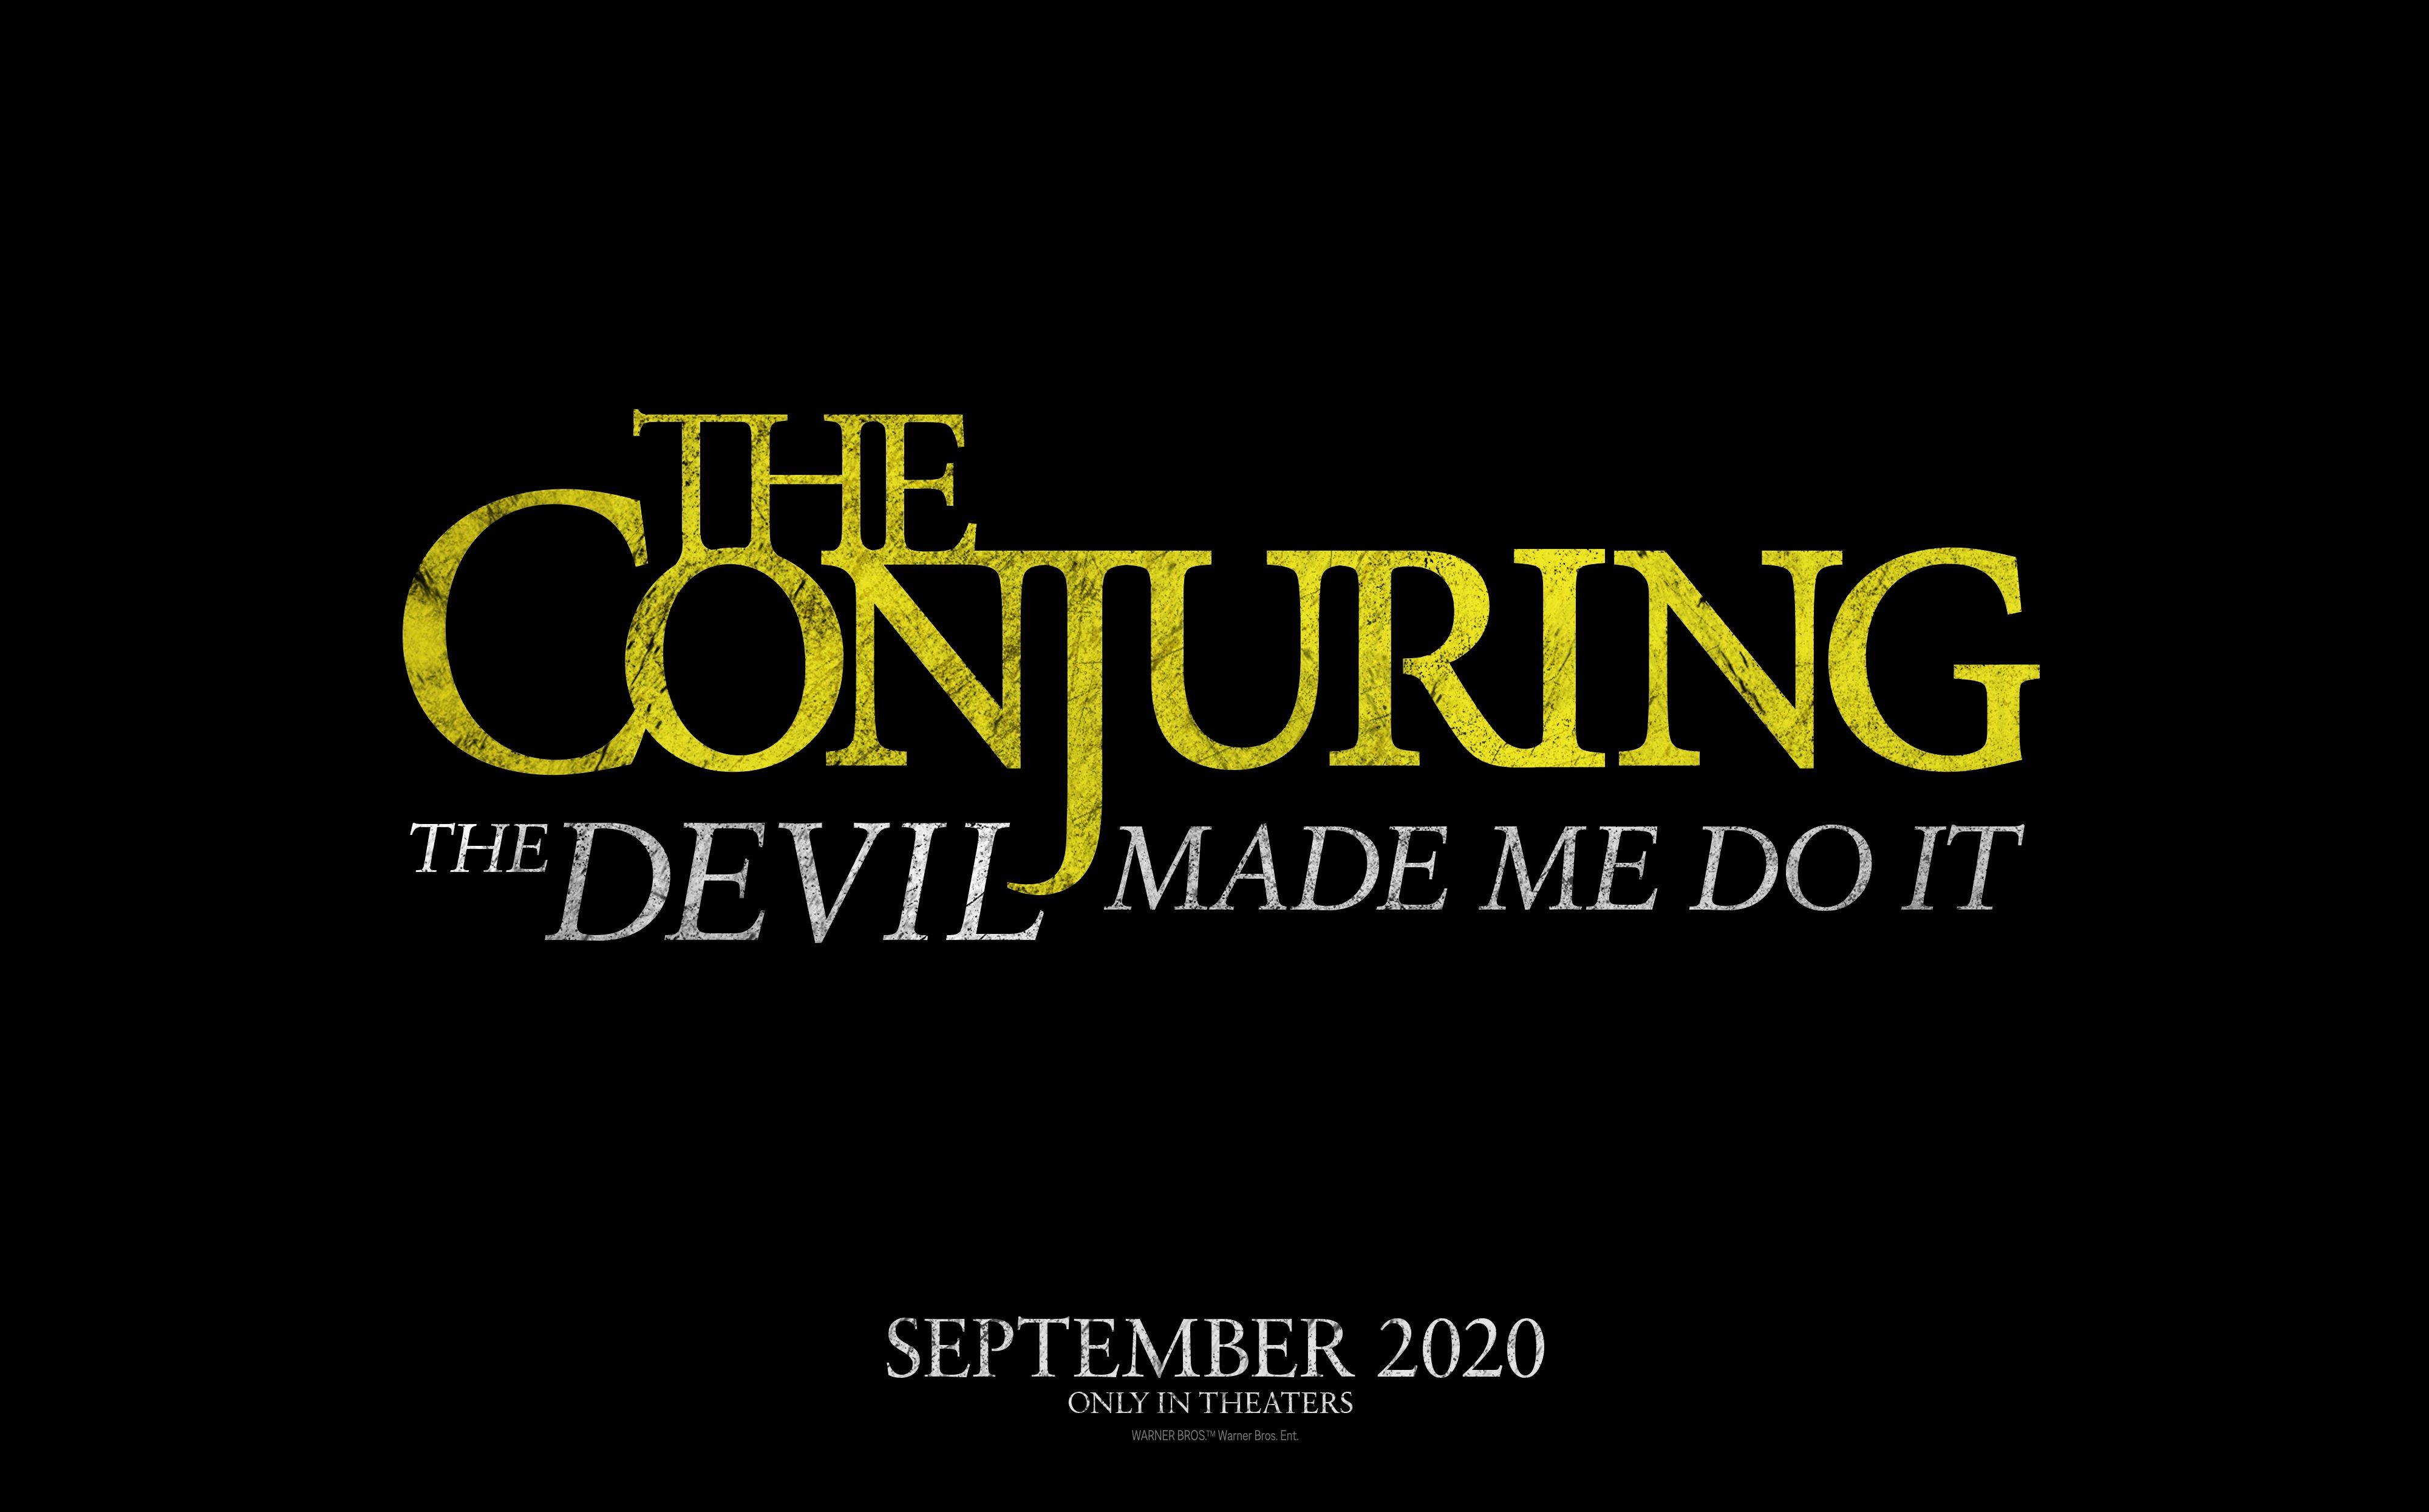 عنوان رسمی فیلم The Conjuring 3